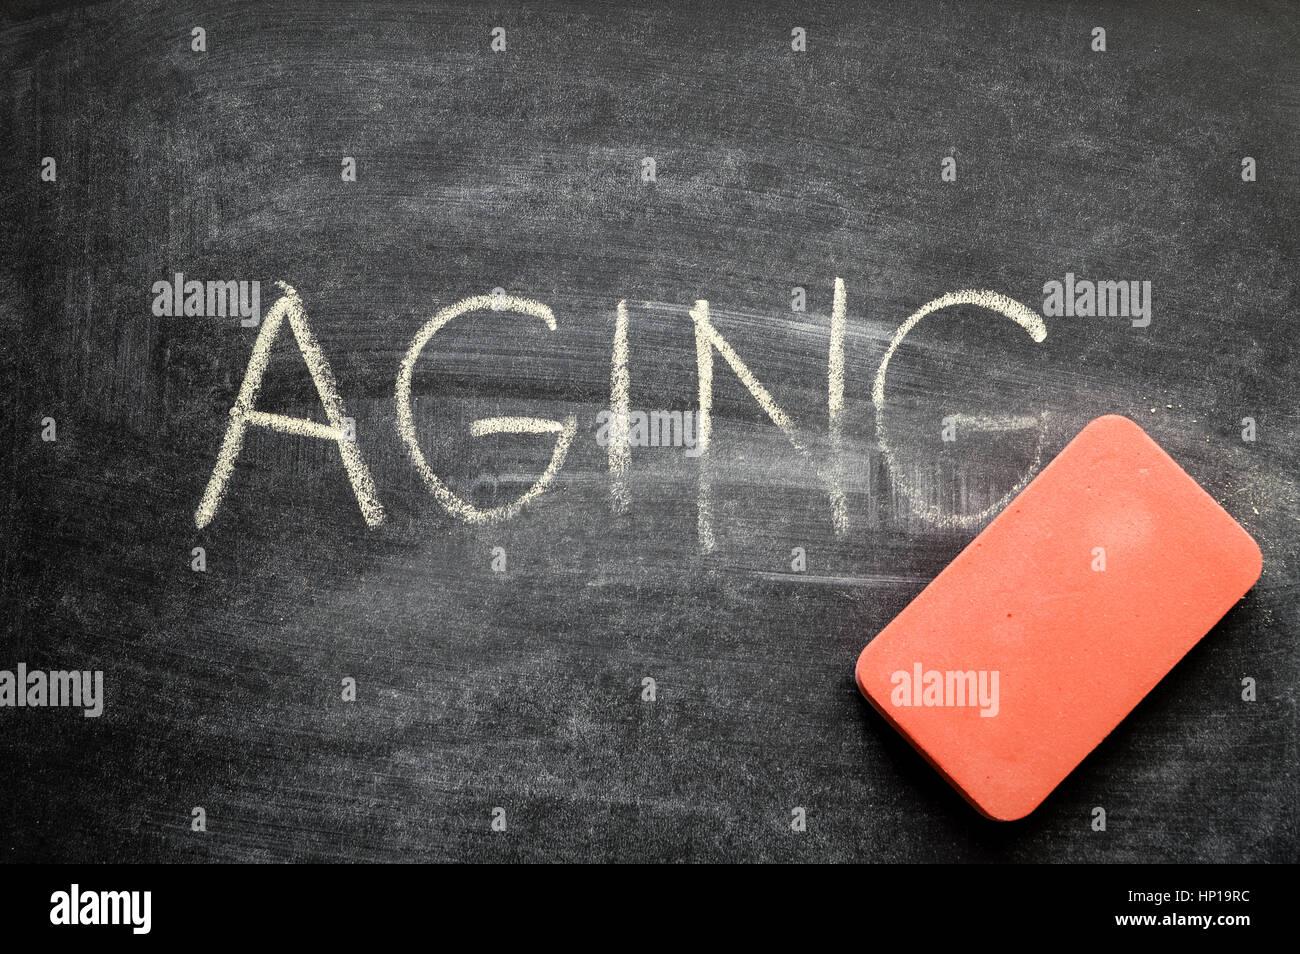 erasing aging, hand written word on blackboard being erased concept - Stock Image